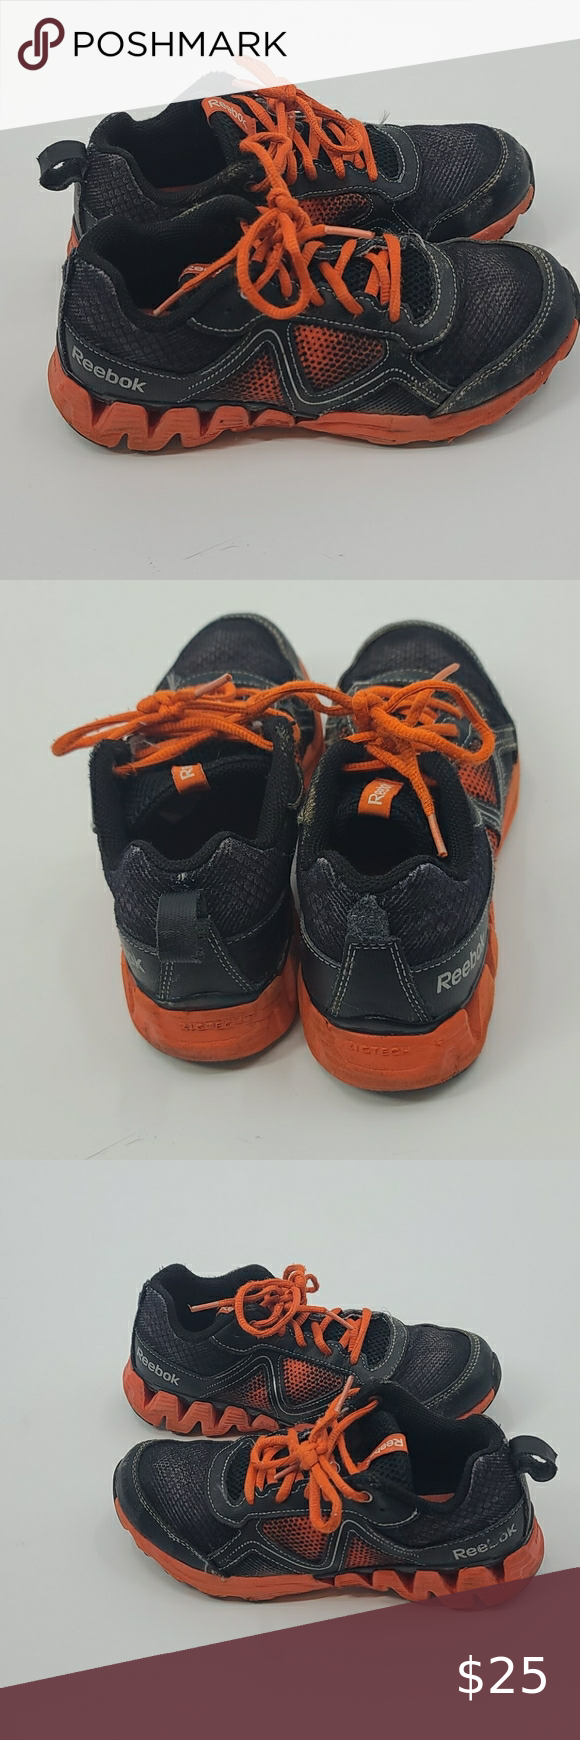 Reebok orange and black zigtech boys